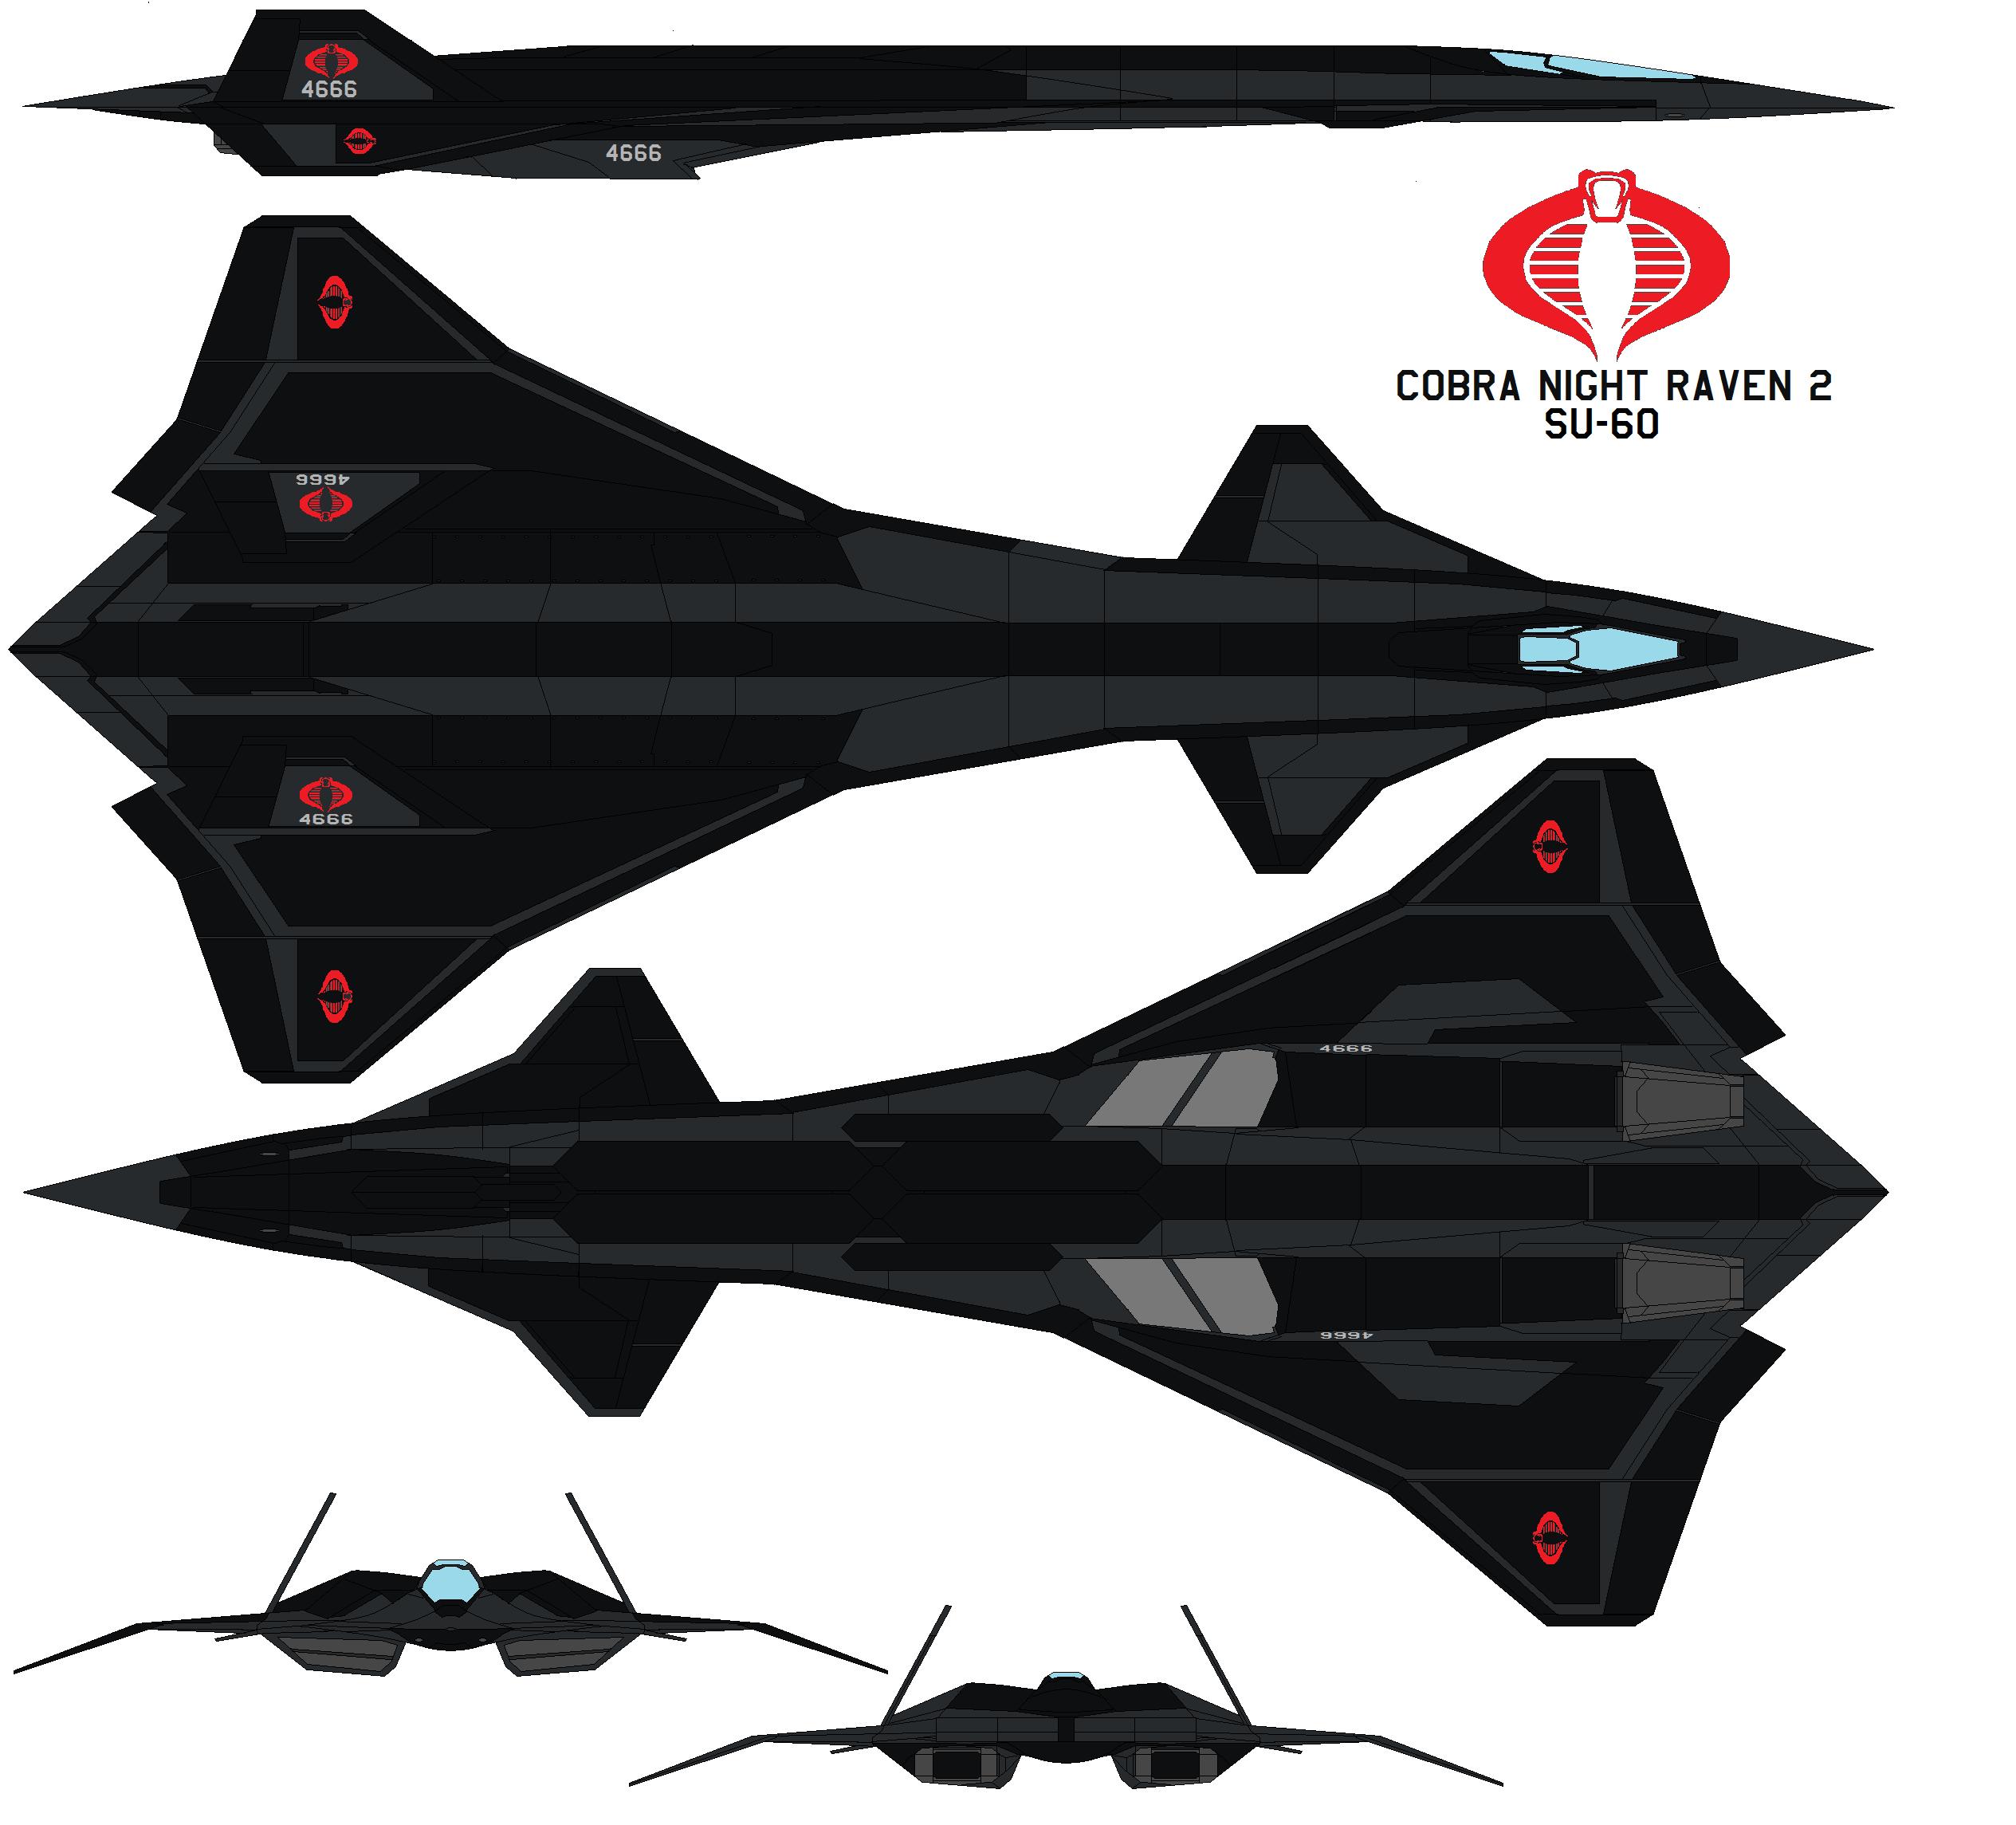 Cobra Night Raven 2 SU-60 By Bagera3005.deviantart.com On